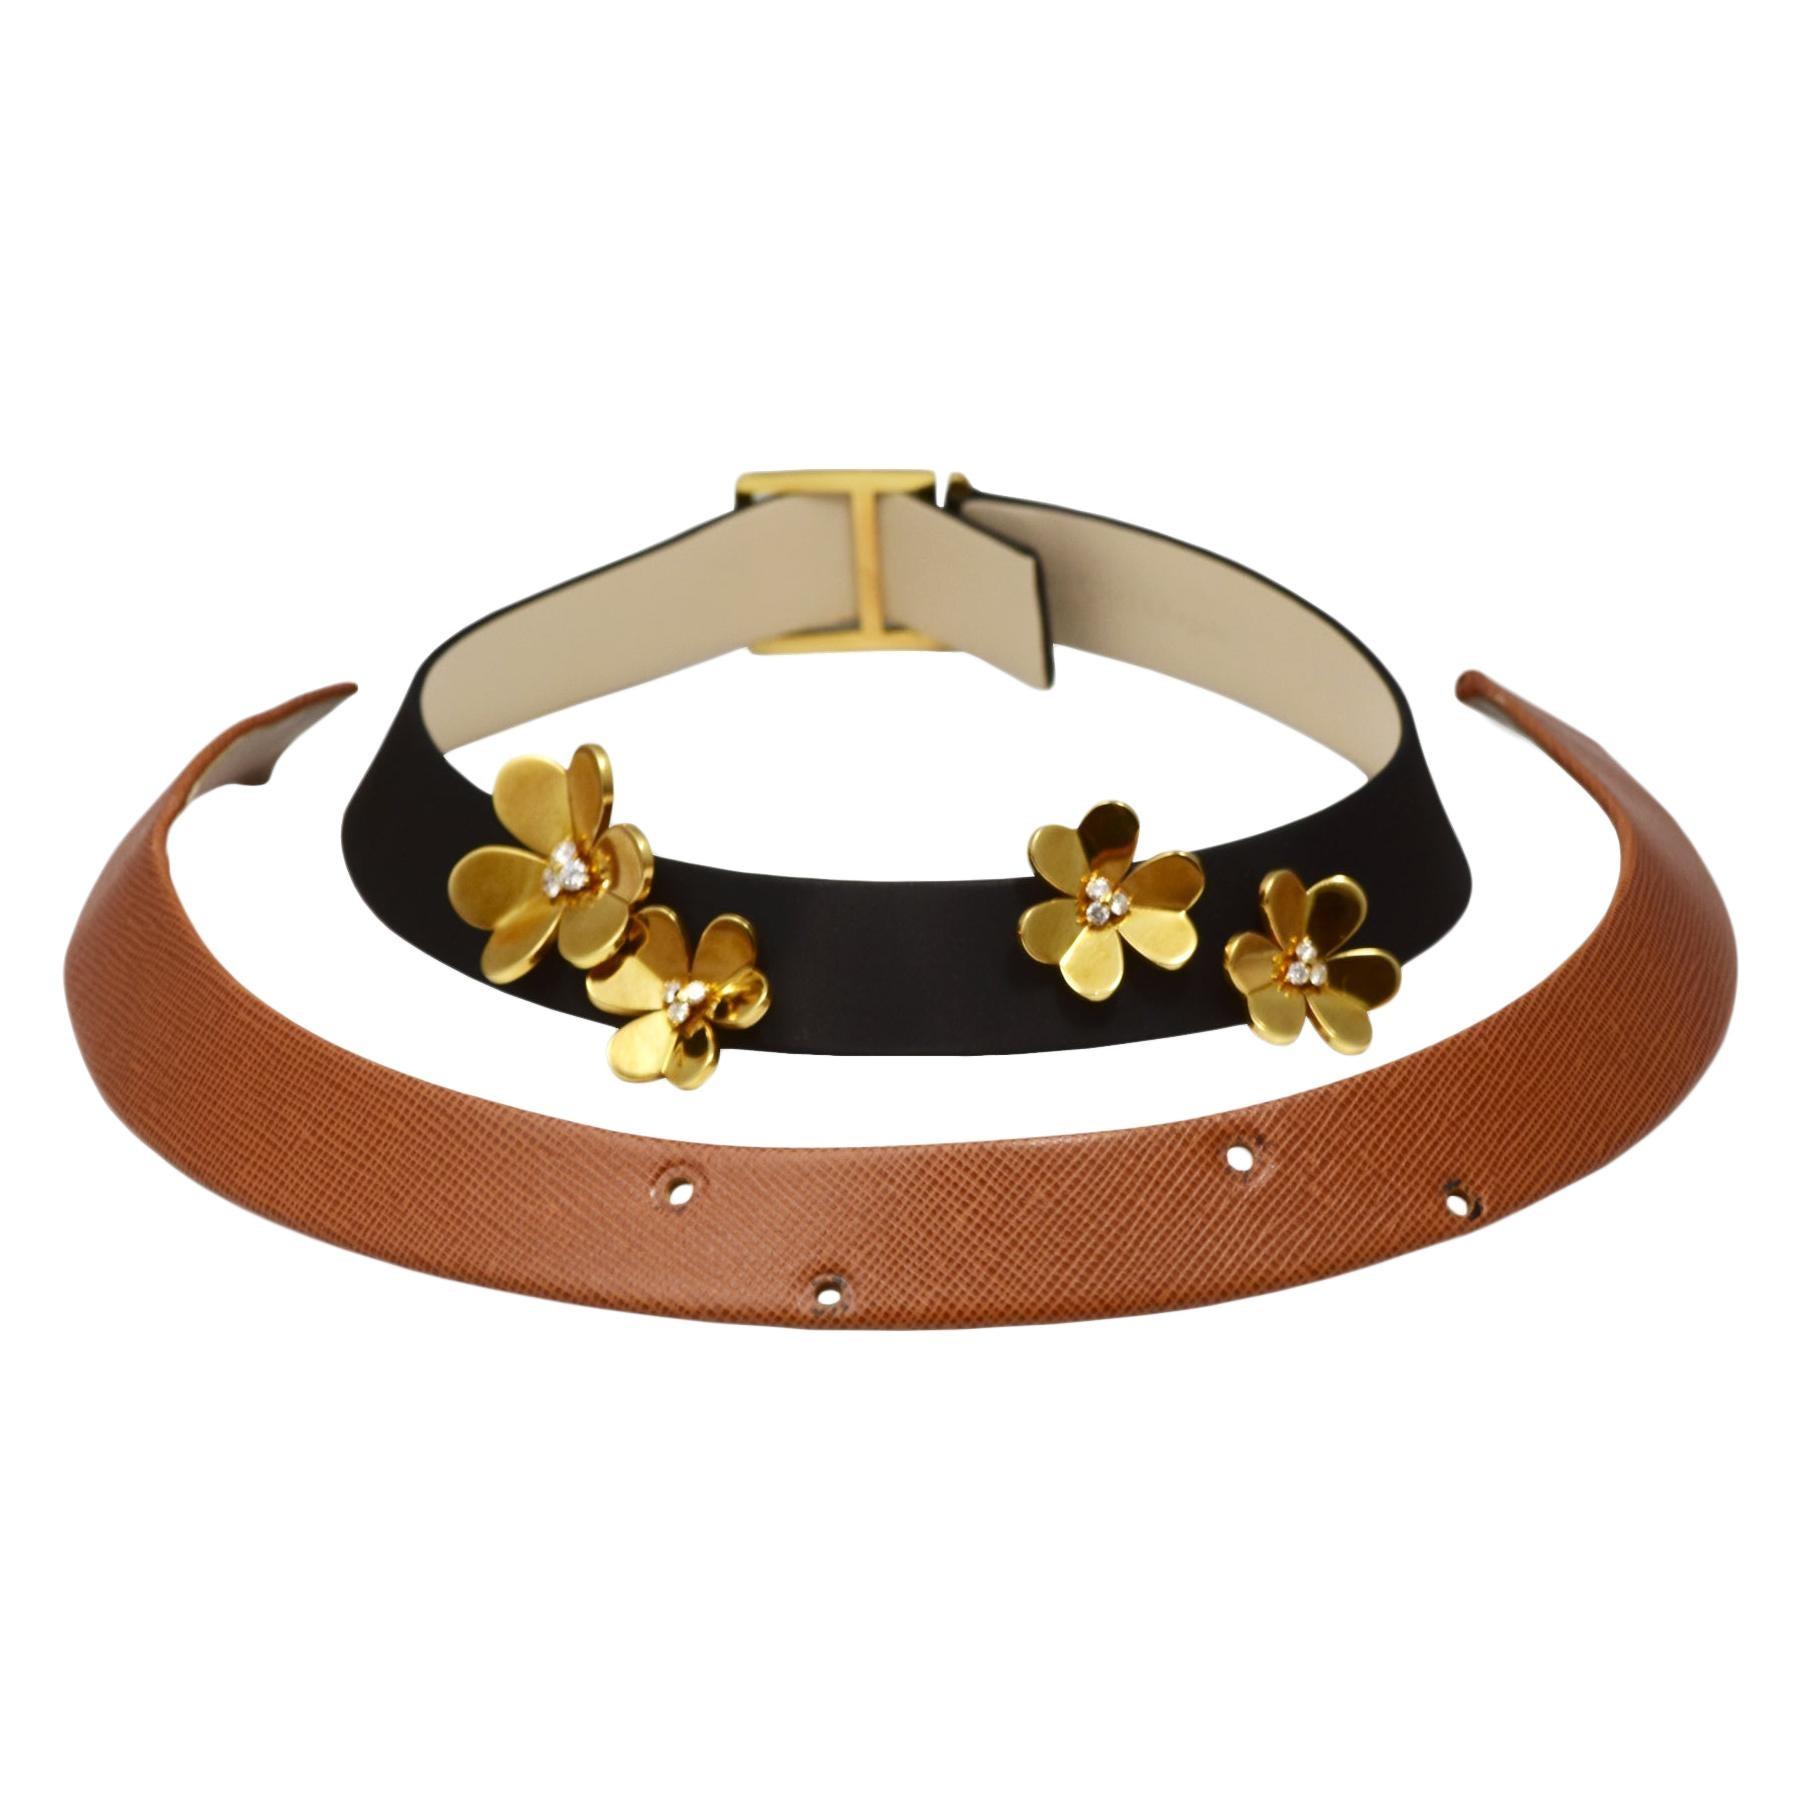 Van Cleef & Arpels Frivole Diamond 18k Yellow Gold Leather Choker